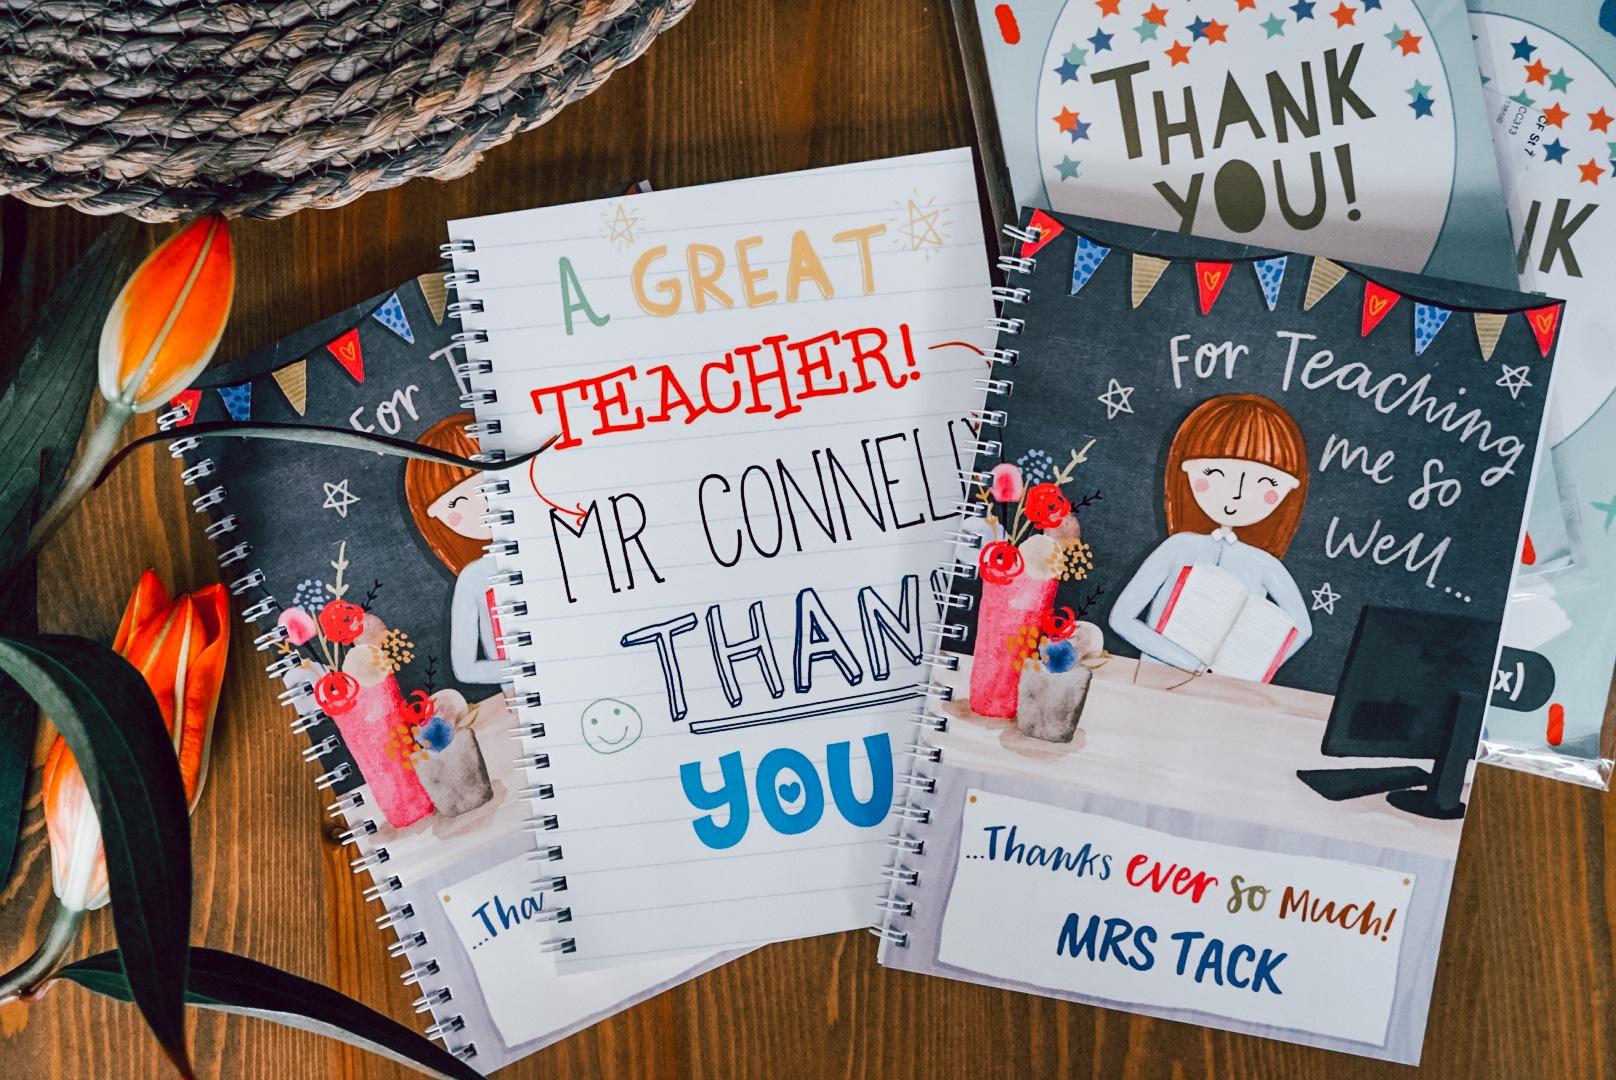 Thanks to a teacher